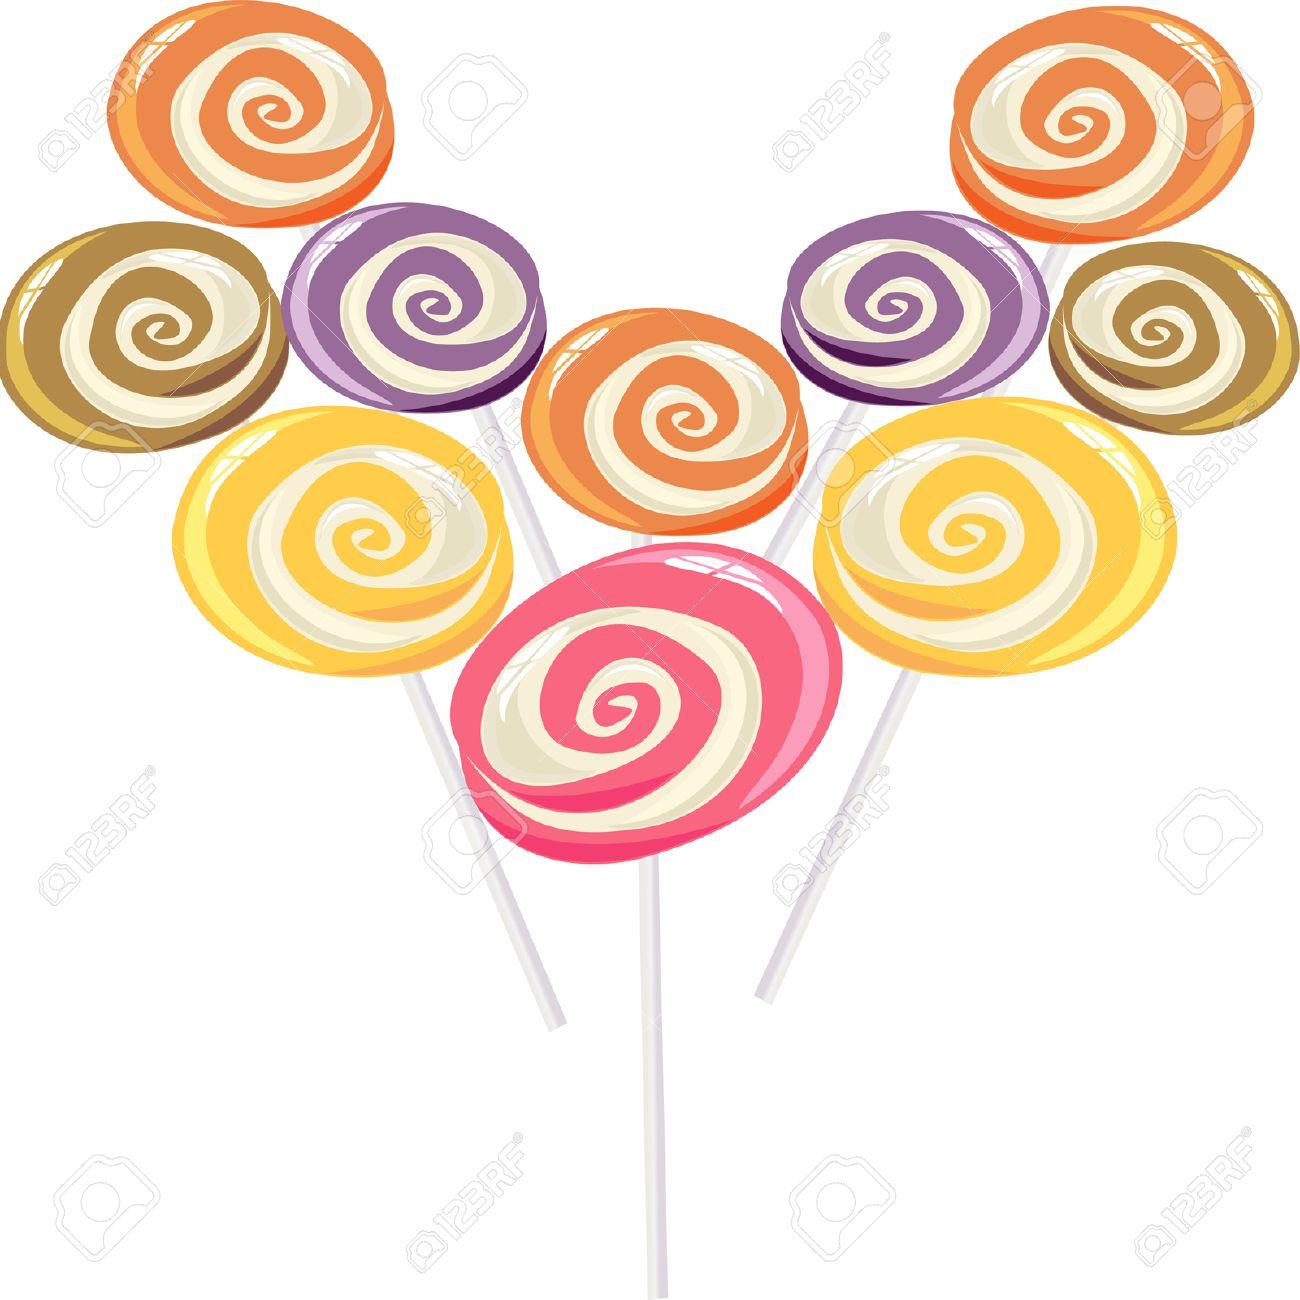 colourful lollipop, heart shape. Stock Vector - 8687487